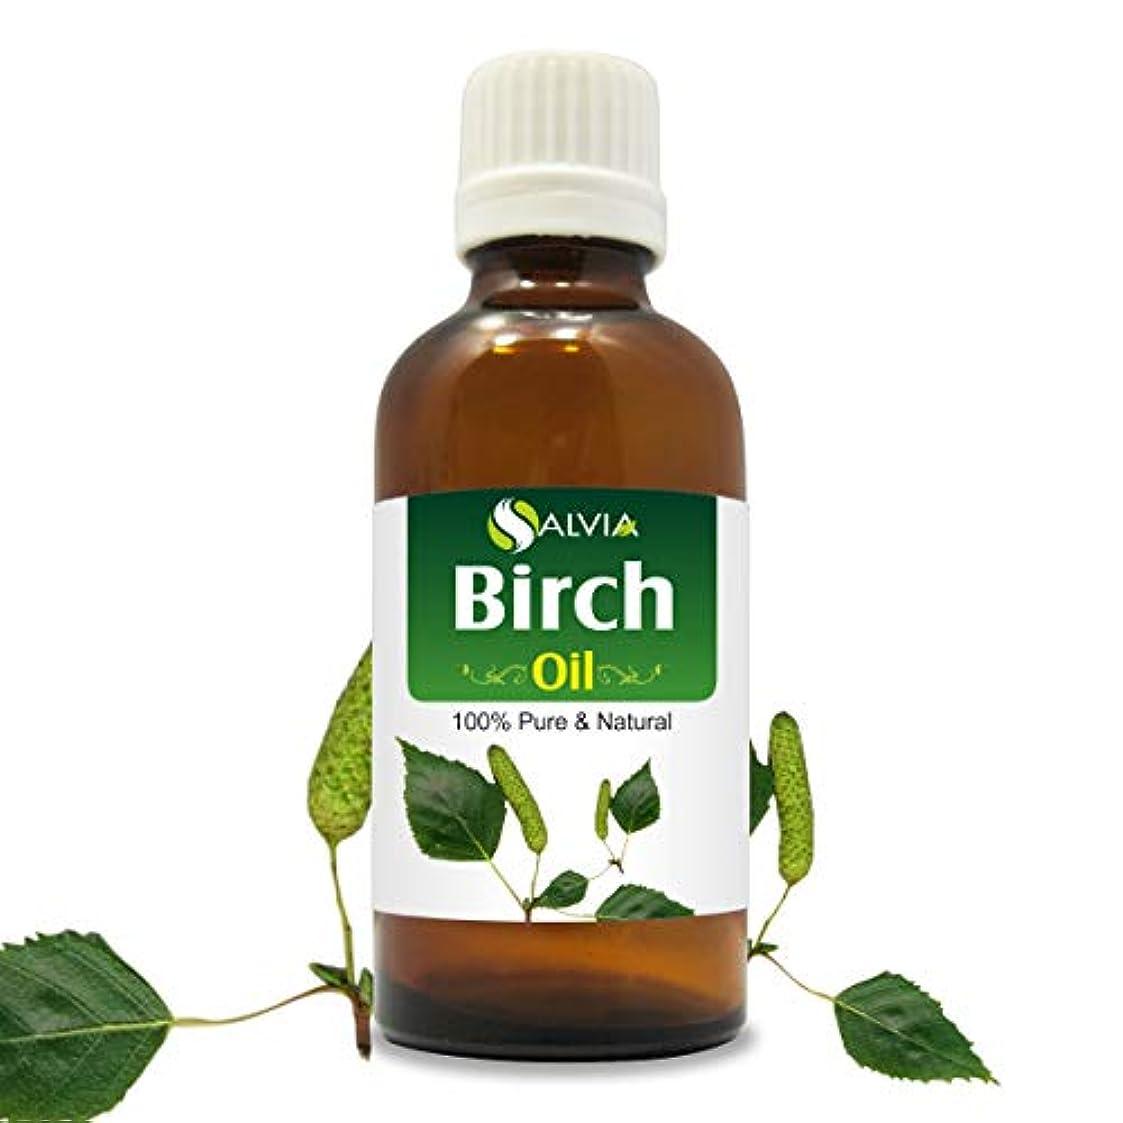 Birch Essential Oil (Betula pendula Betula alba) 100% Pure & Natural - Undiluted Uncut Therapeutic Grade - Aromatherapy...